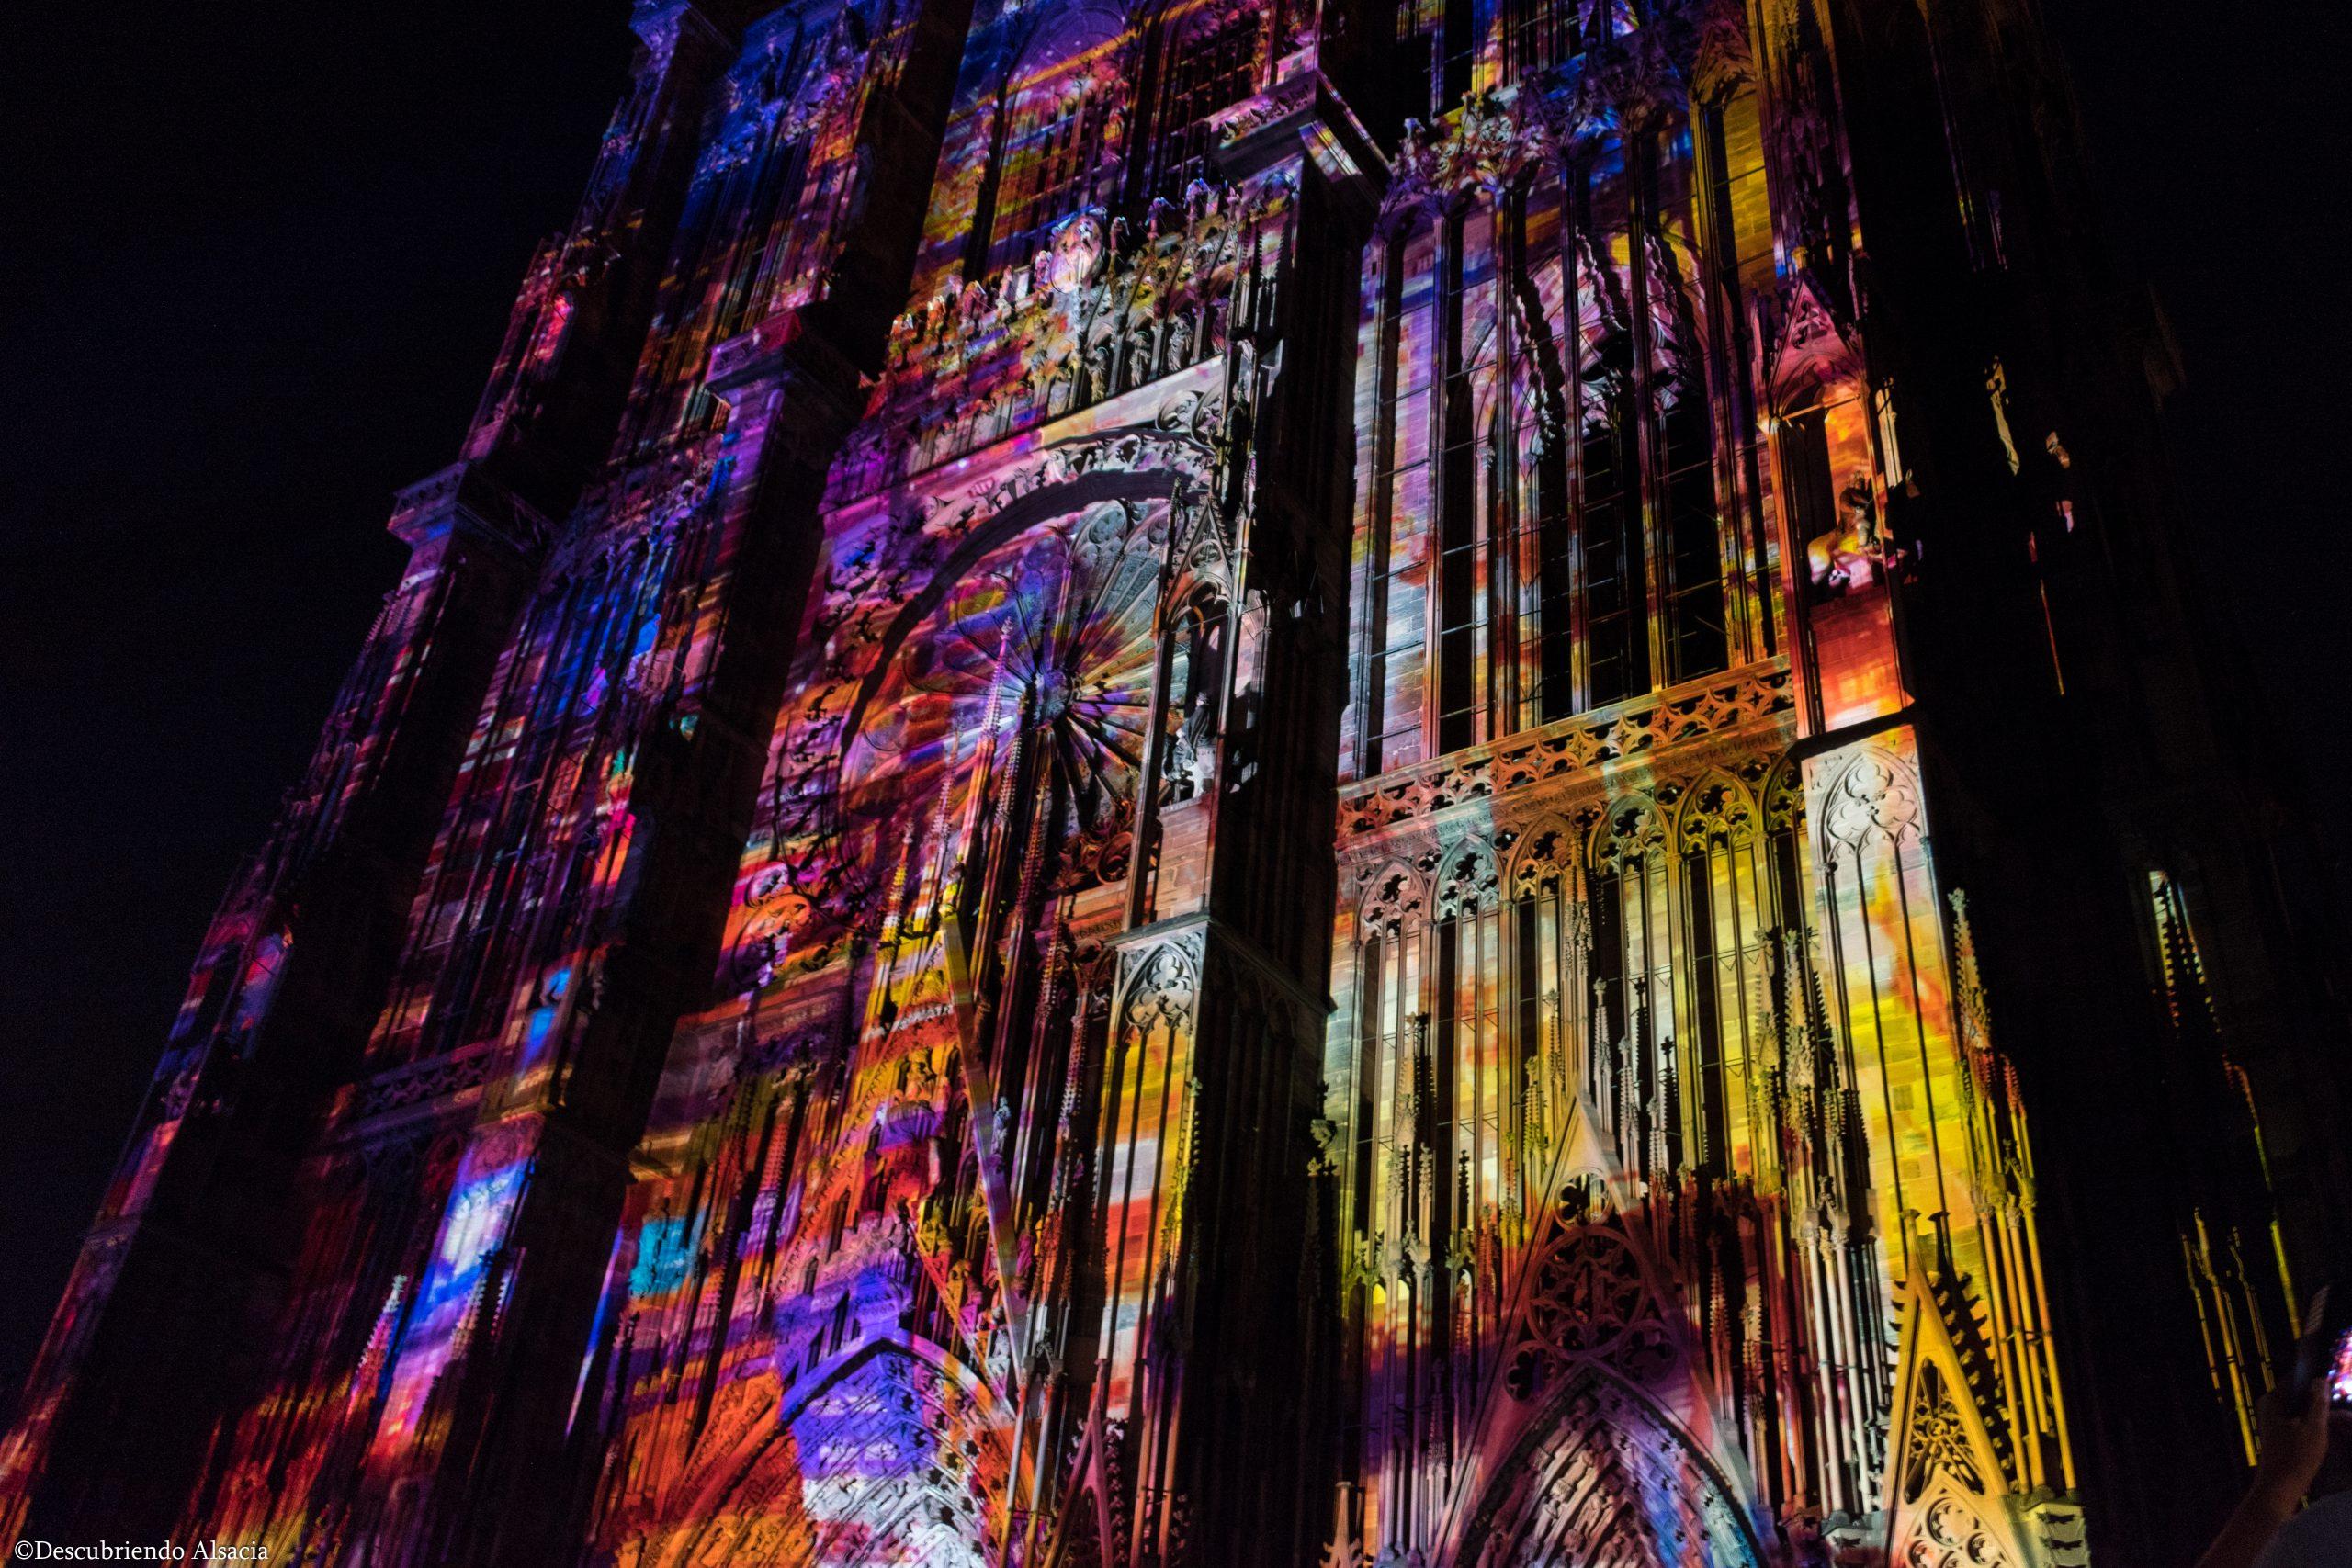 Tarde de verano en Estrasburgo